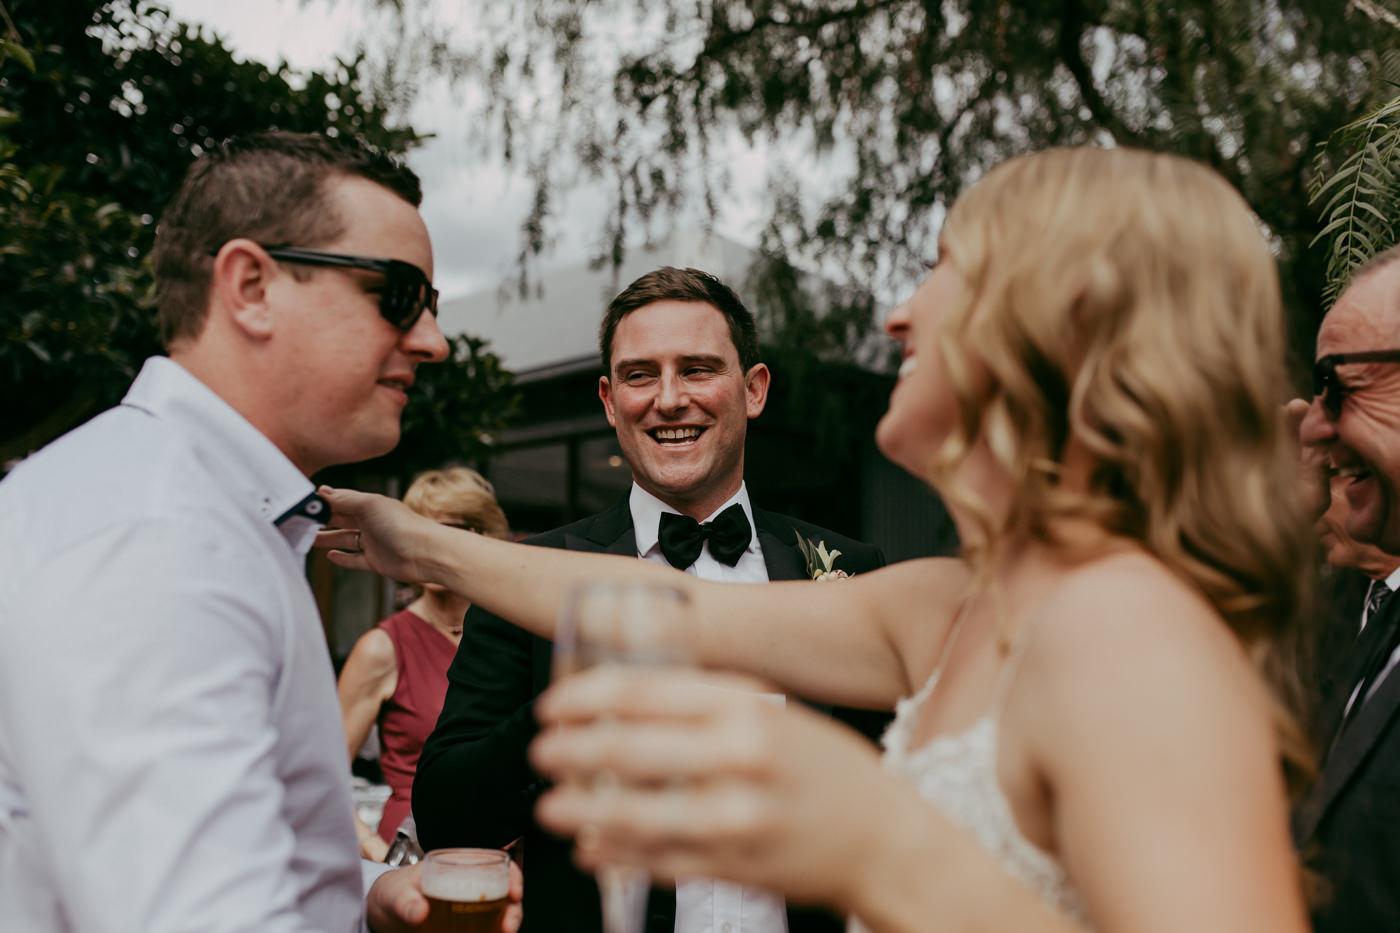 Anthony & Eliet - Wagga Wagga Wedding - Country NSW - Samantha Heather Photography-115.jpg